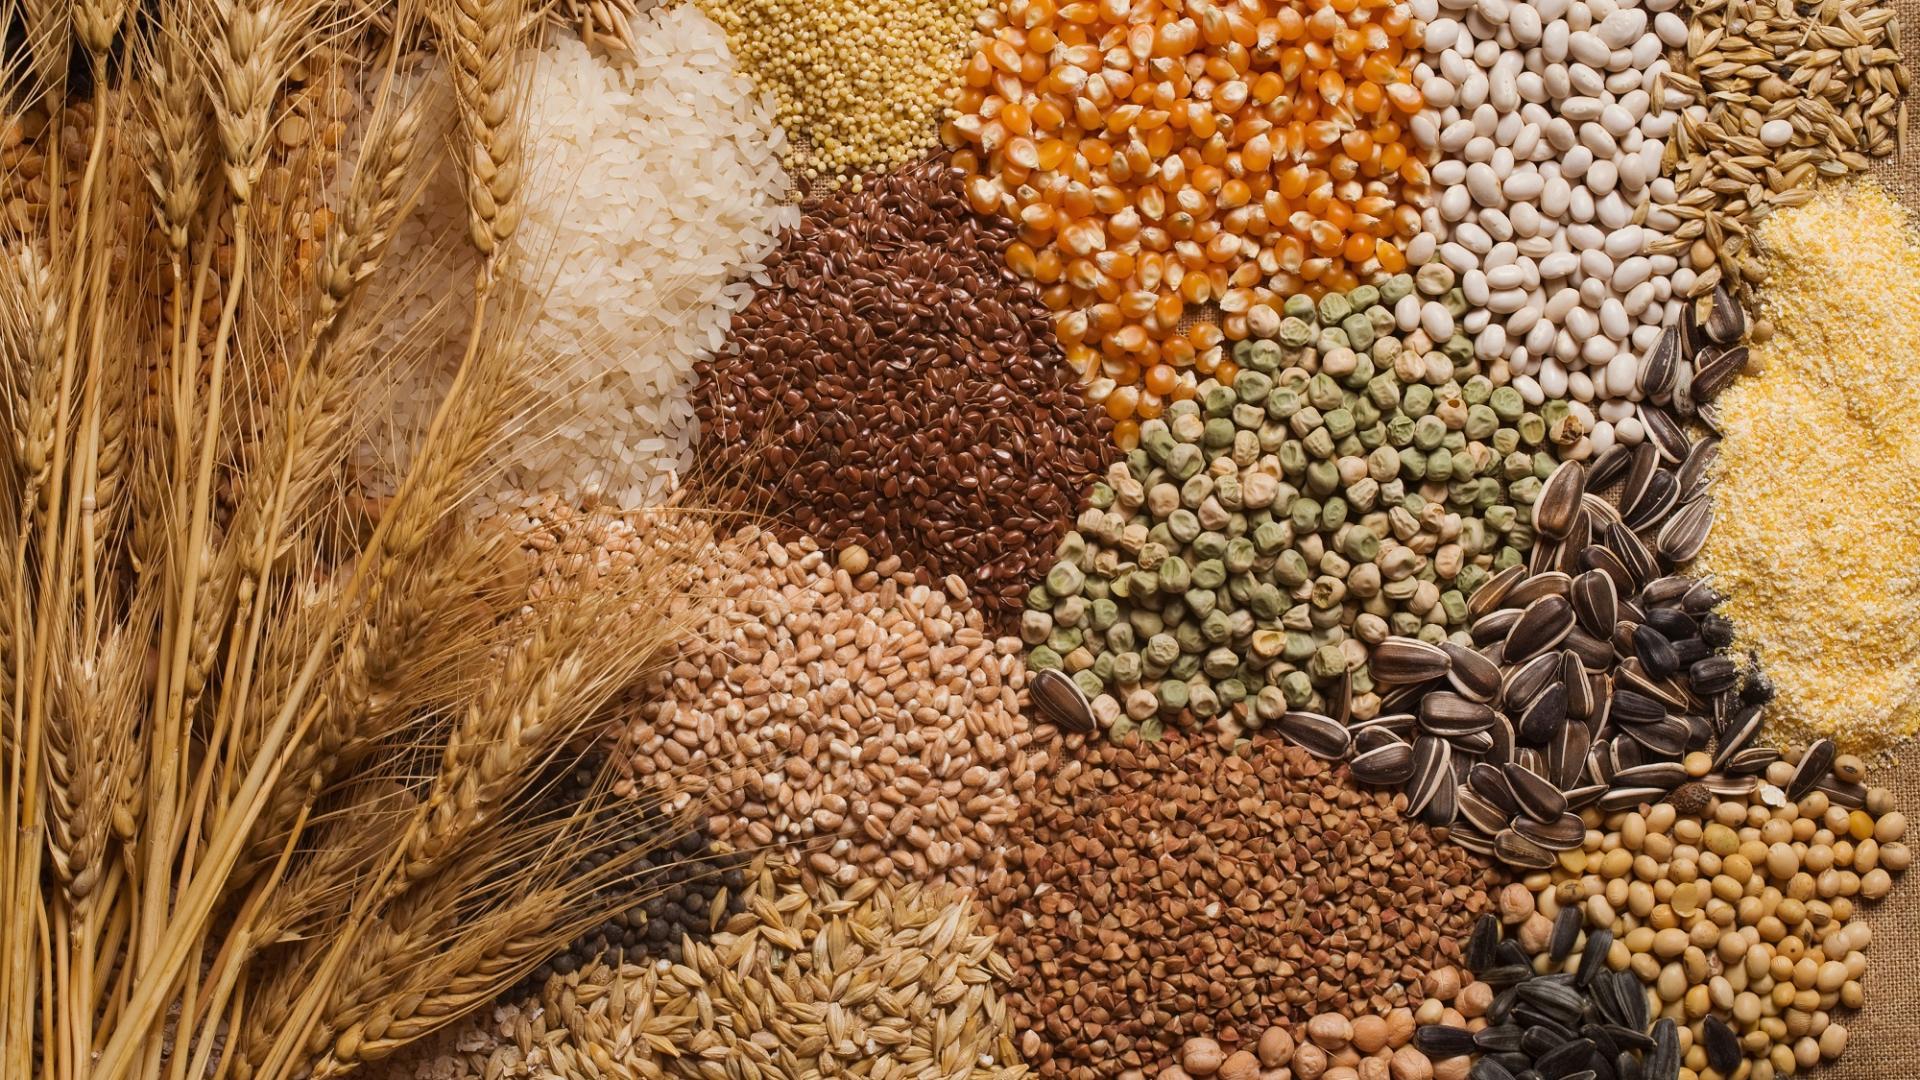 Getreide, Korn, Hafer